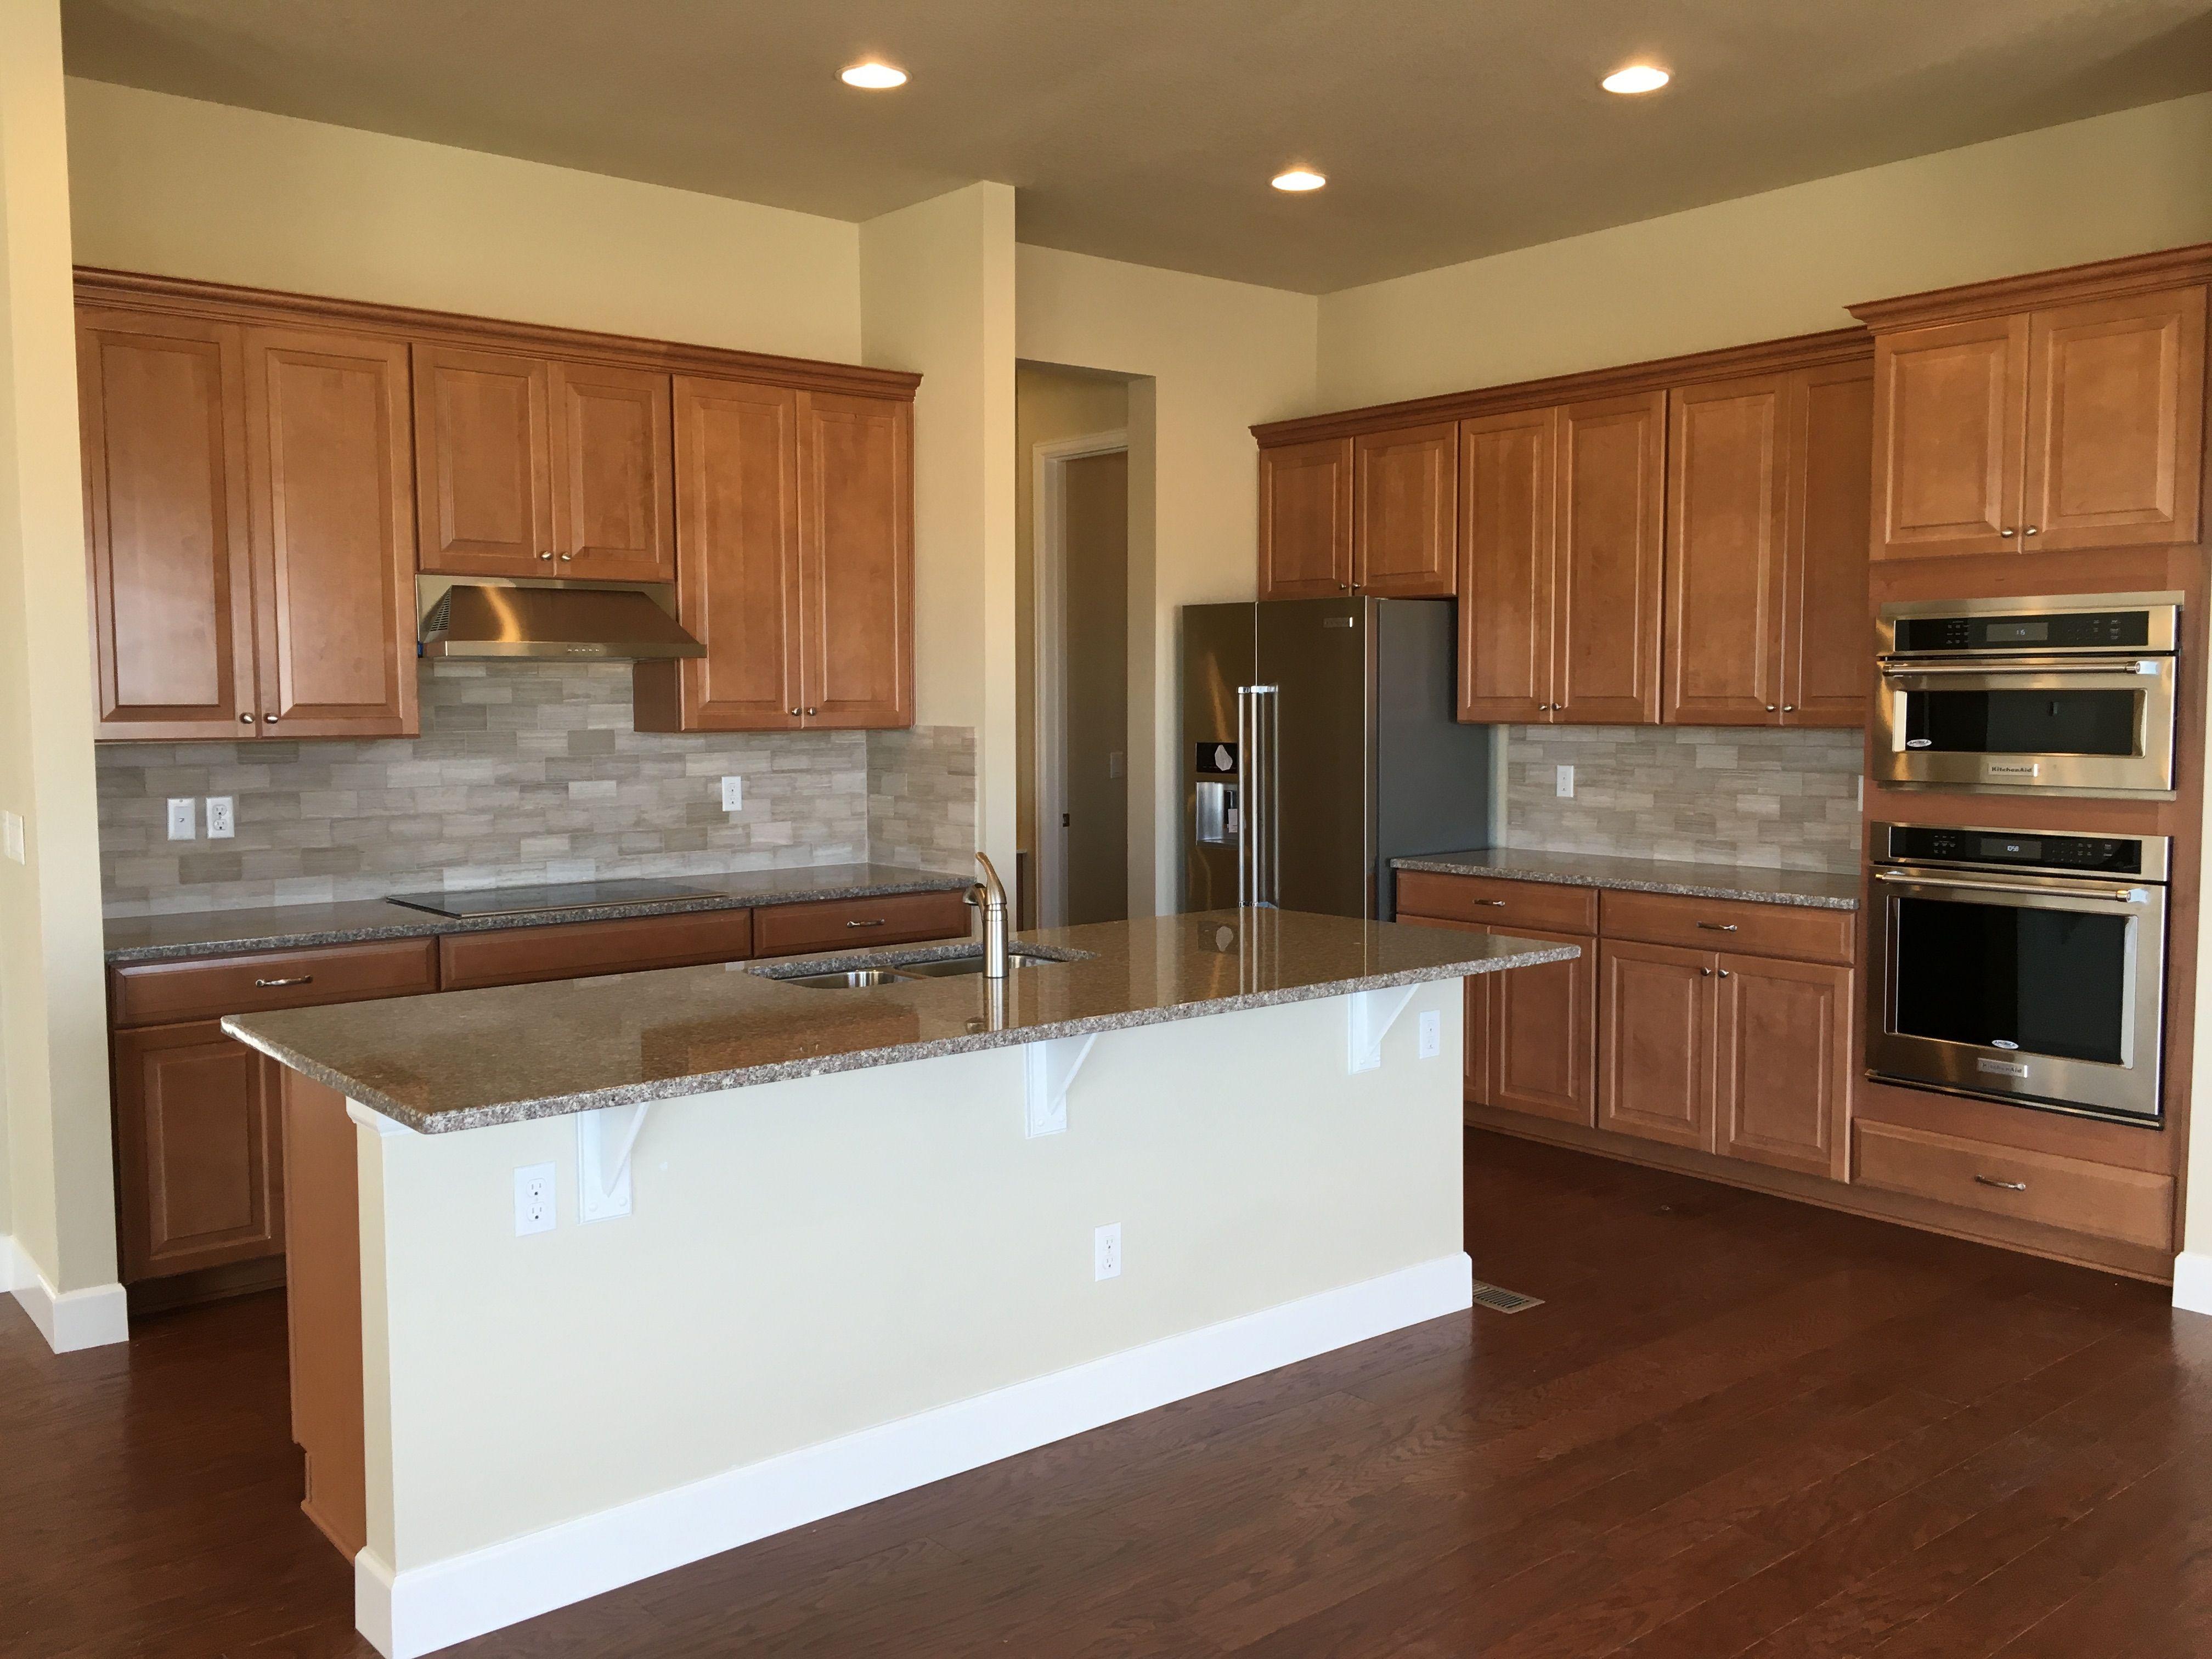 Timberlake Spice Cabinets Mccords Way Saddle Hardwood Floors Bainbrook Brown Granite Ctop